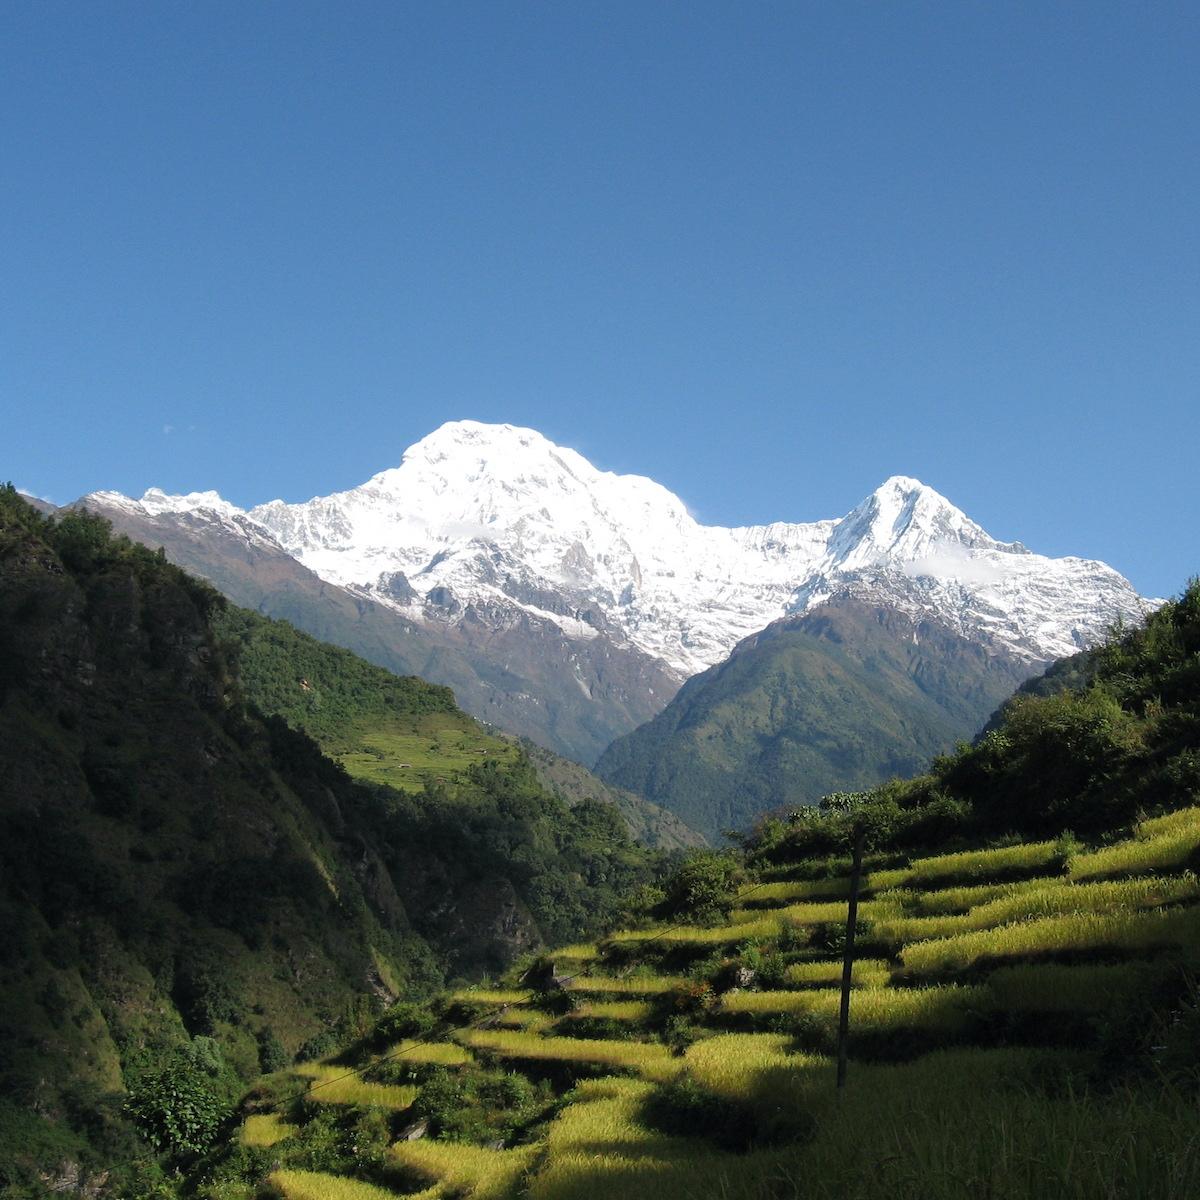 The Himalayas of Nepal